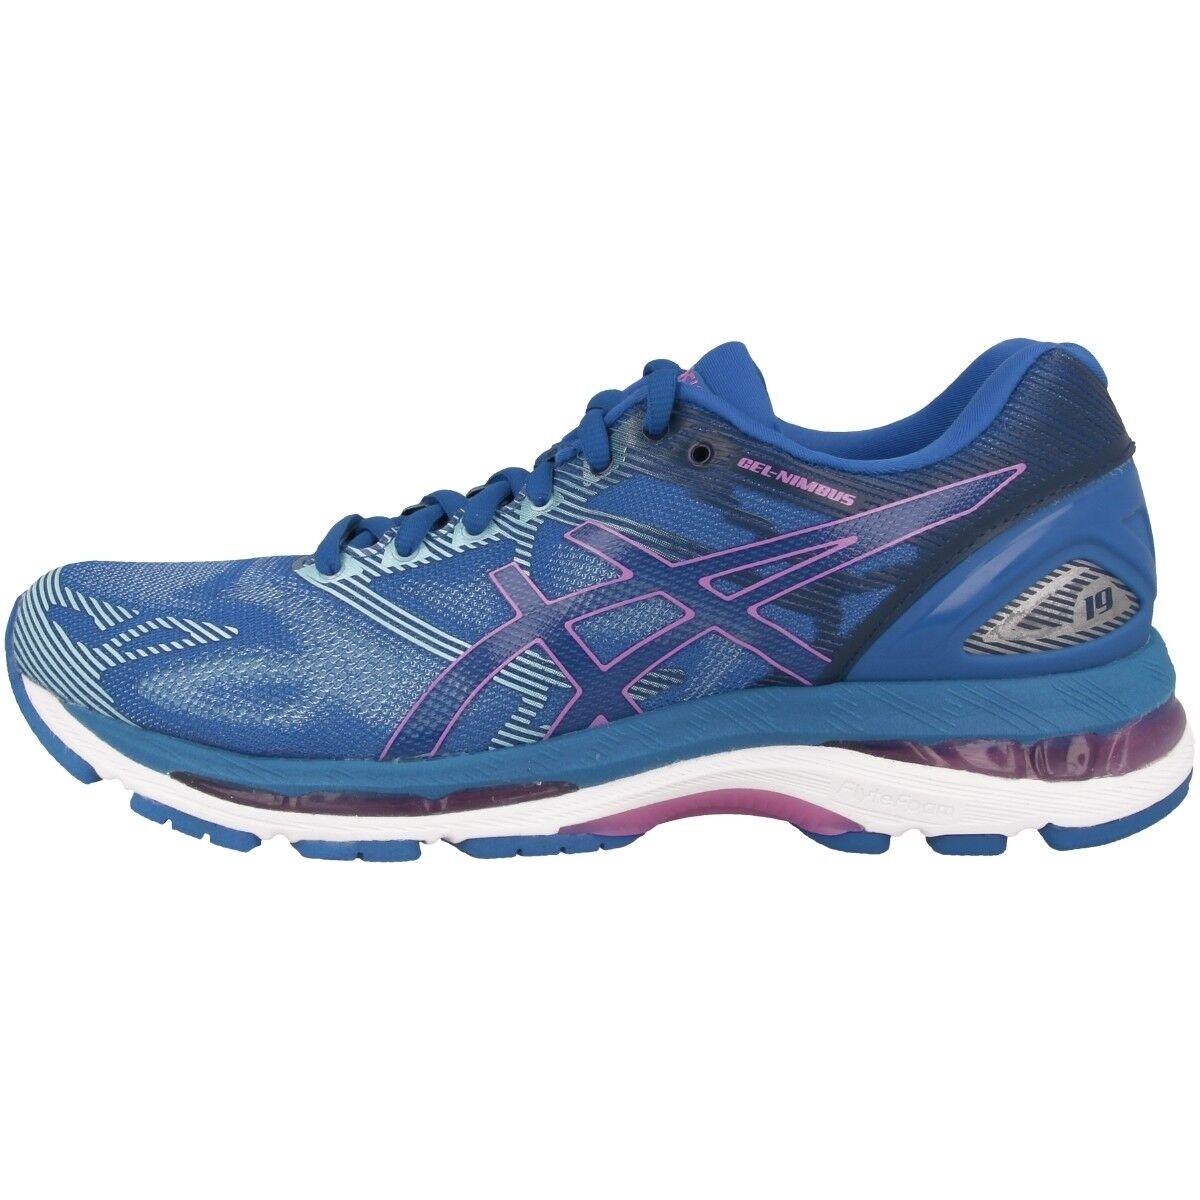 Asics Gel-Nimbus 19 Damens Damen Laufschuhe Blau purple violet Running T750N-4832